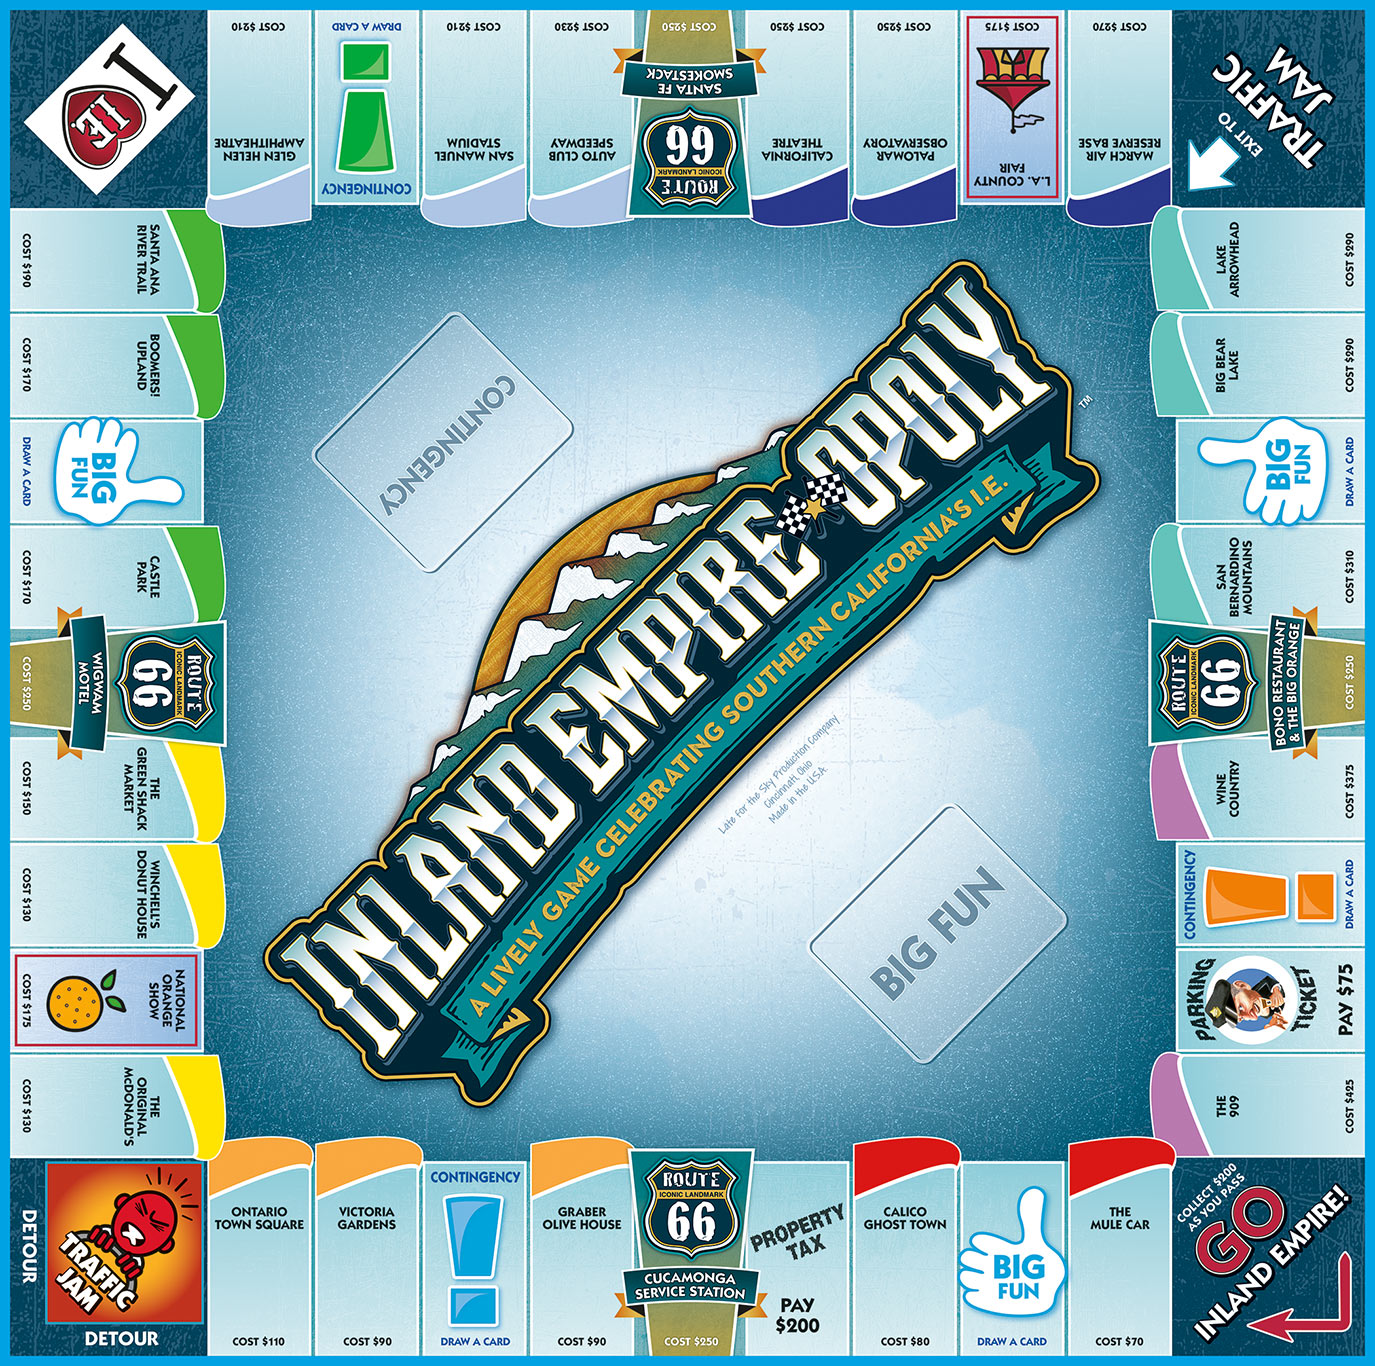 INLAND EMPIRE-OPOLY Board Game